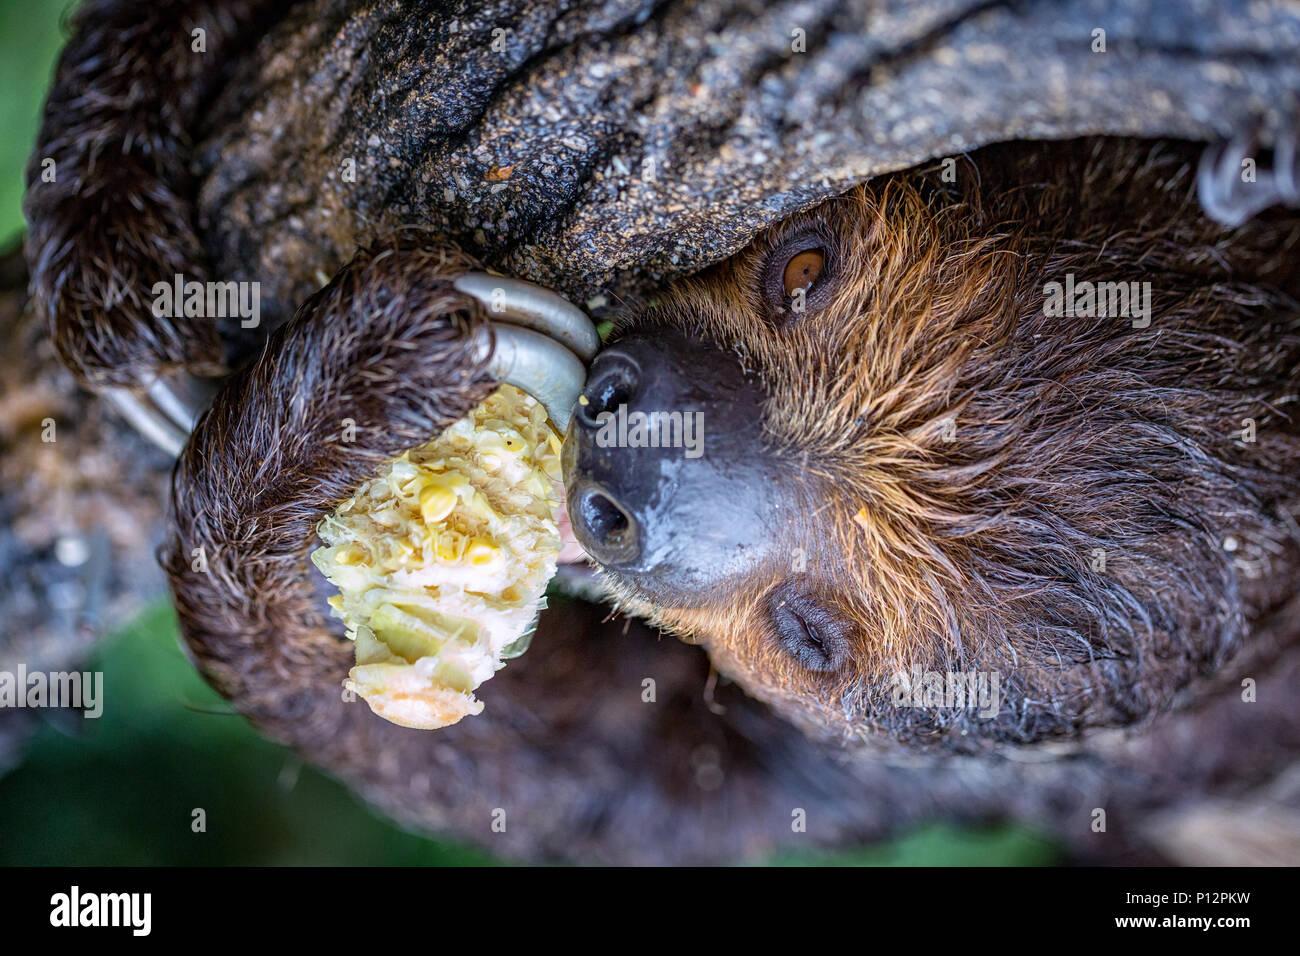 Megalonychidae; (zwei ? Finger Faultiere), Zoo Singapur, Singapur Stockbild